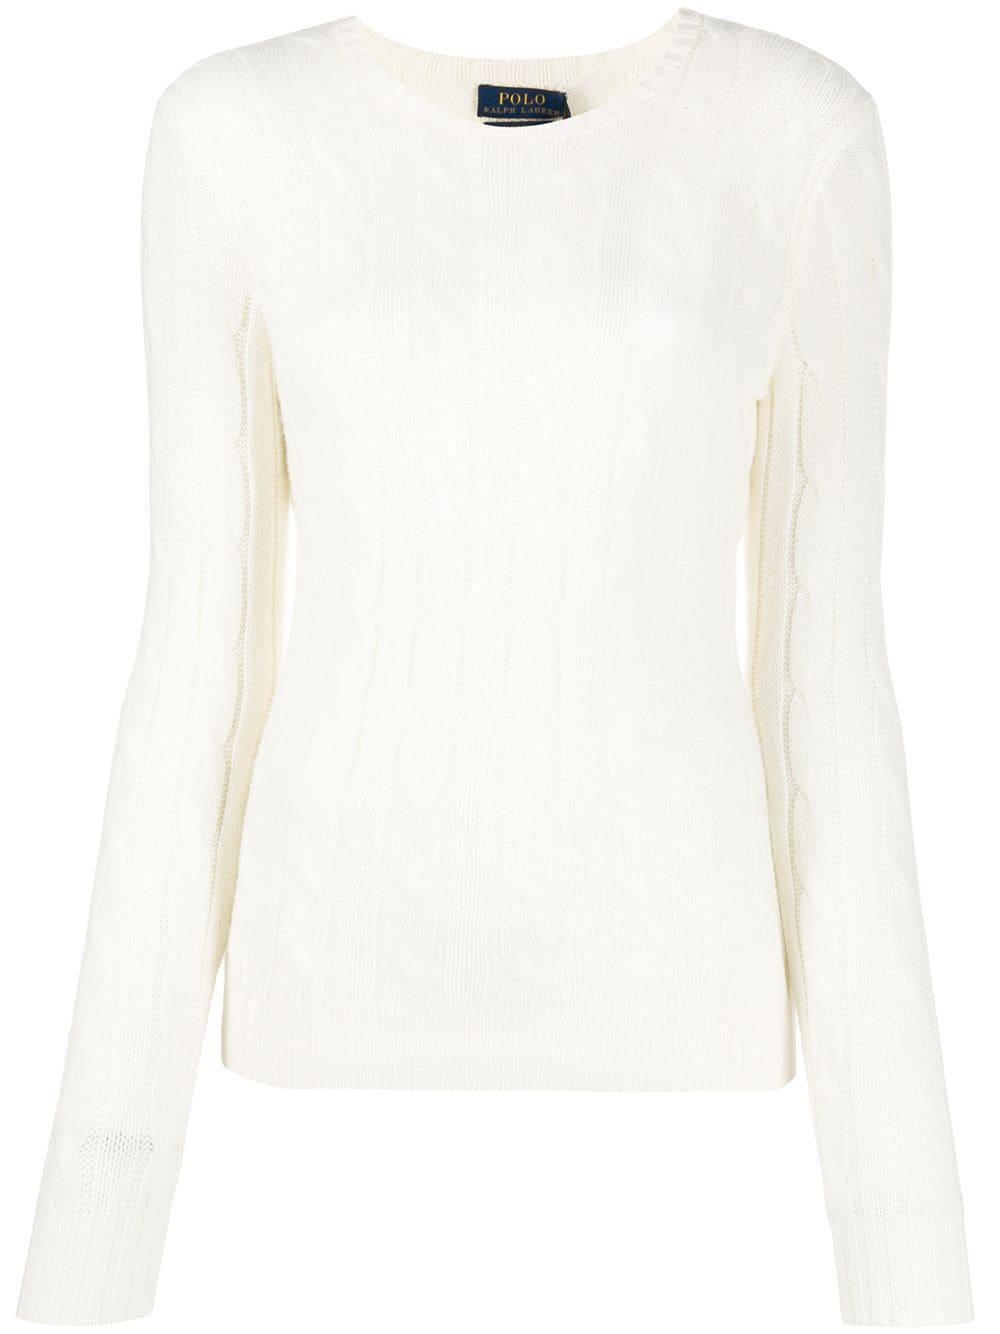 Julianna Classic Sweater Item # 211780379003